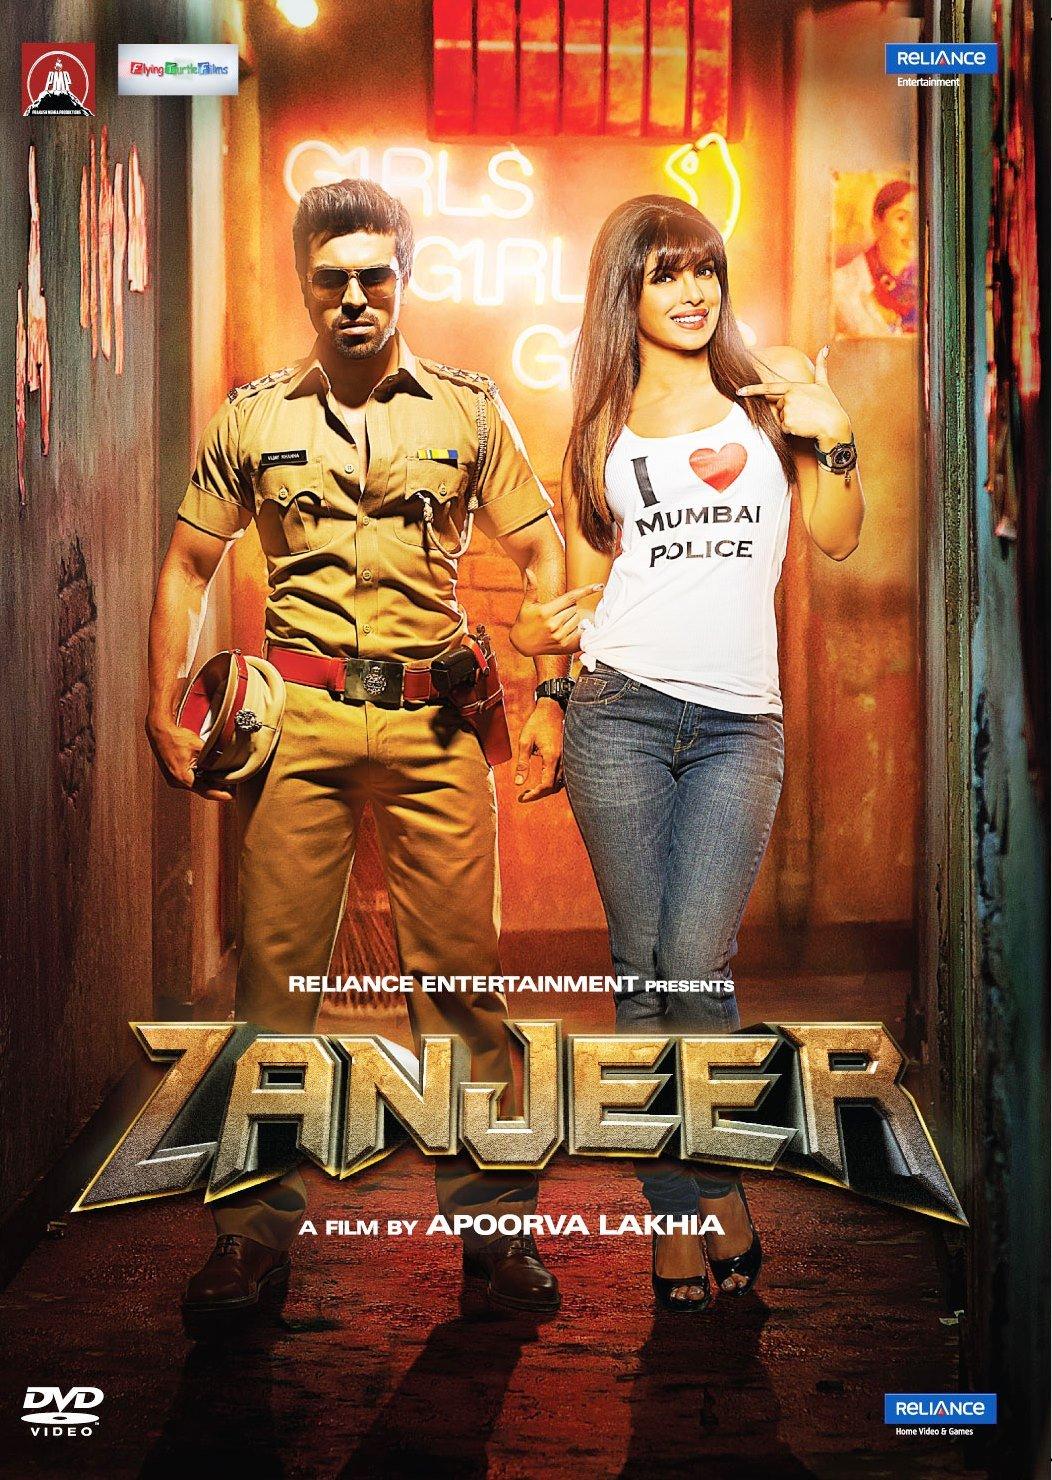 Zanjeer (2013) Hindi 720p HEVC HDRip x265 AAC ESubs Full Bollywood Movie [700MB]